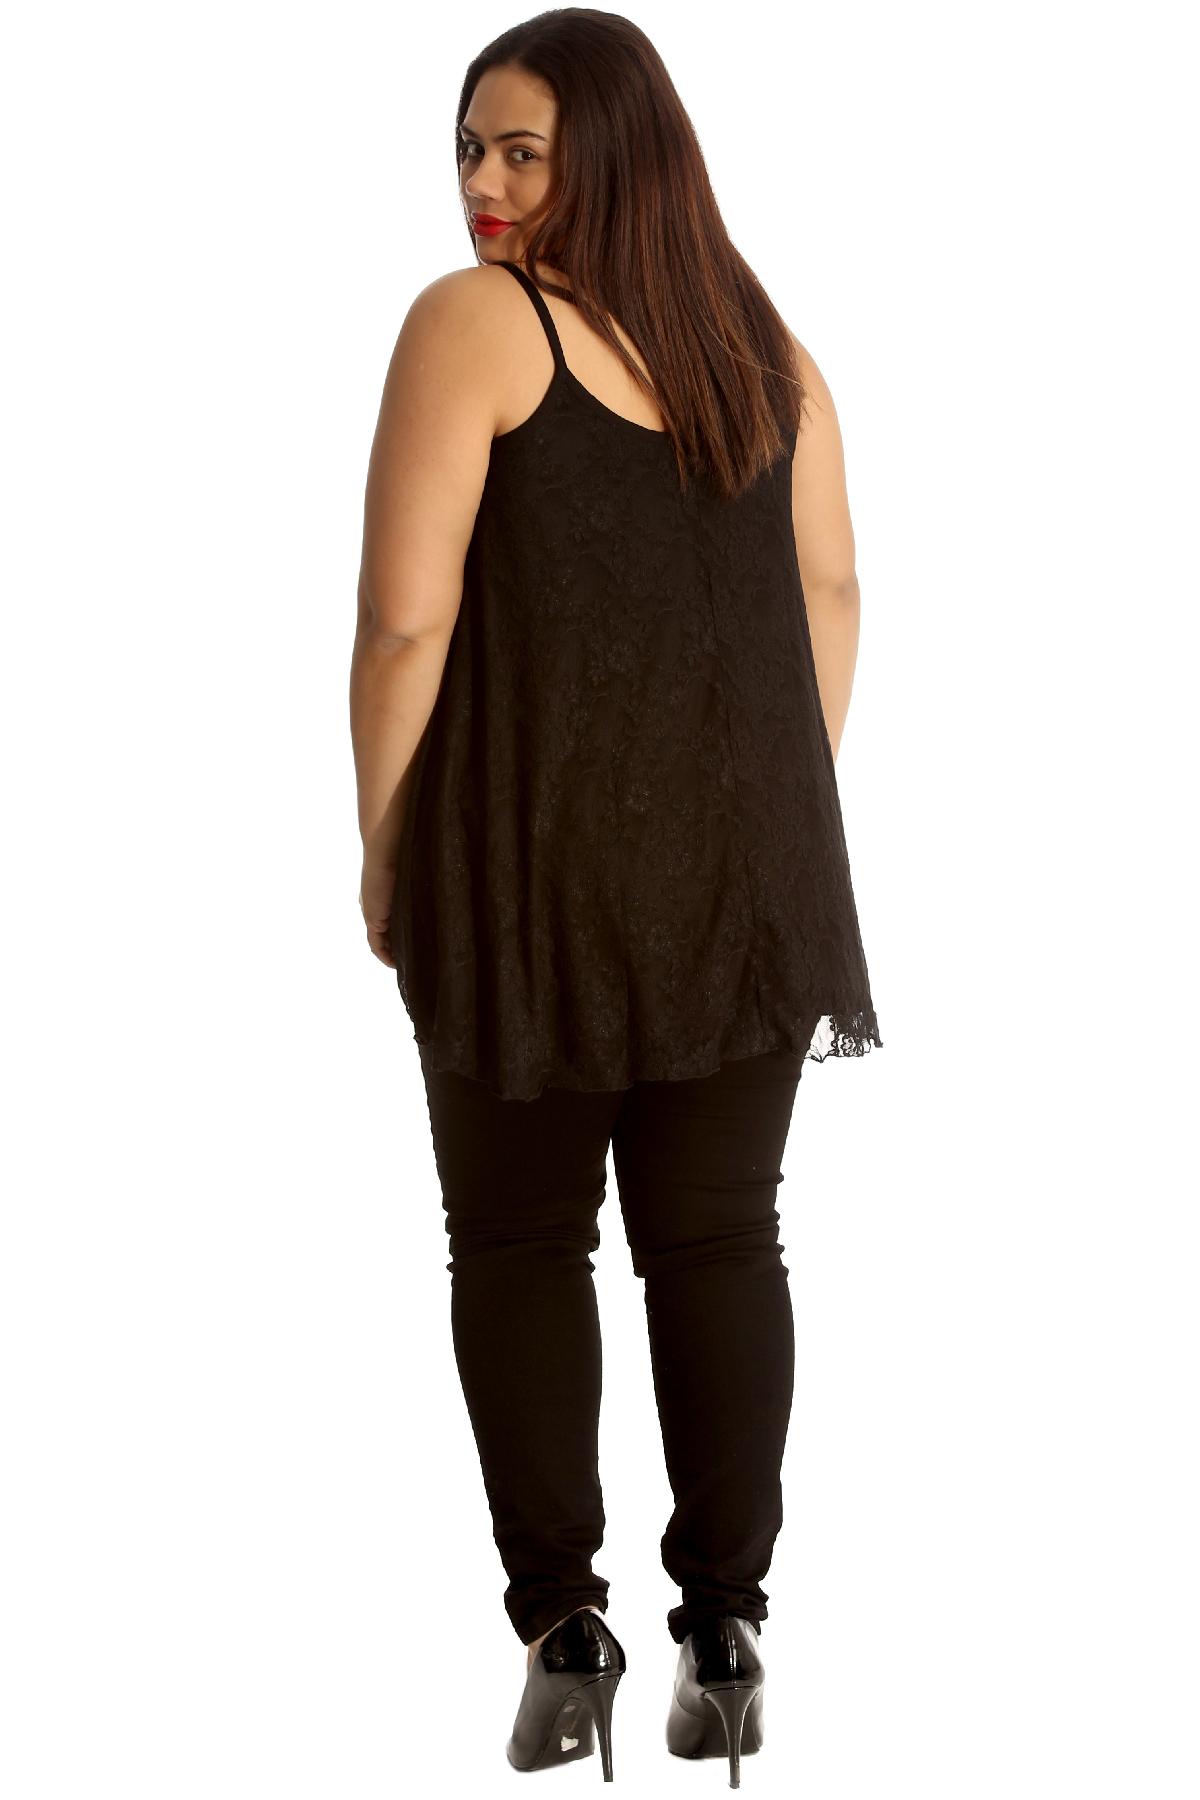 Womens Top Ladies Camisole Tank Top Floral Lace Summer Tunic Plus Size Nouvelle